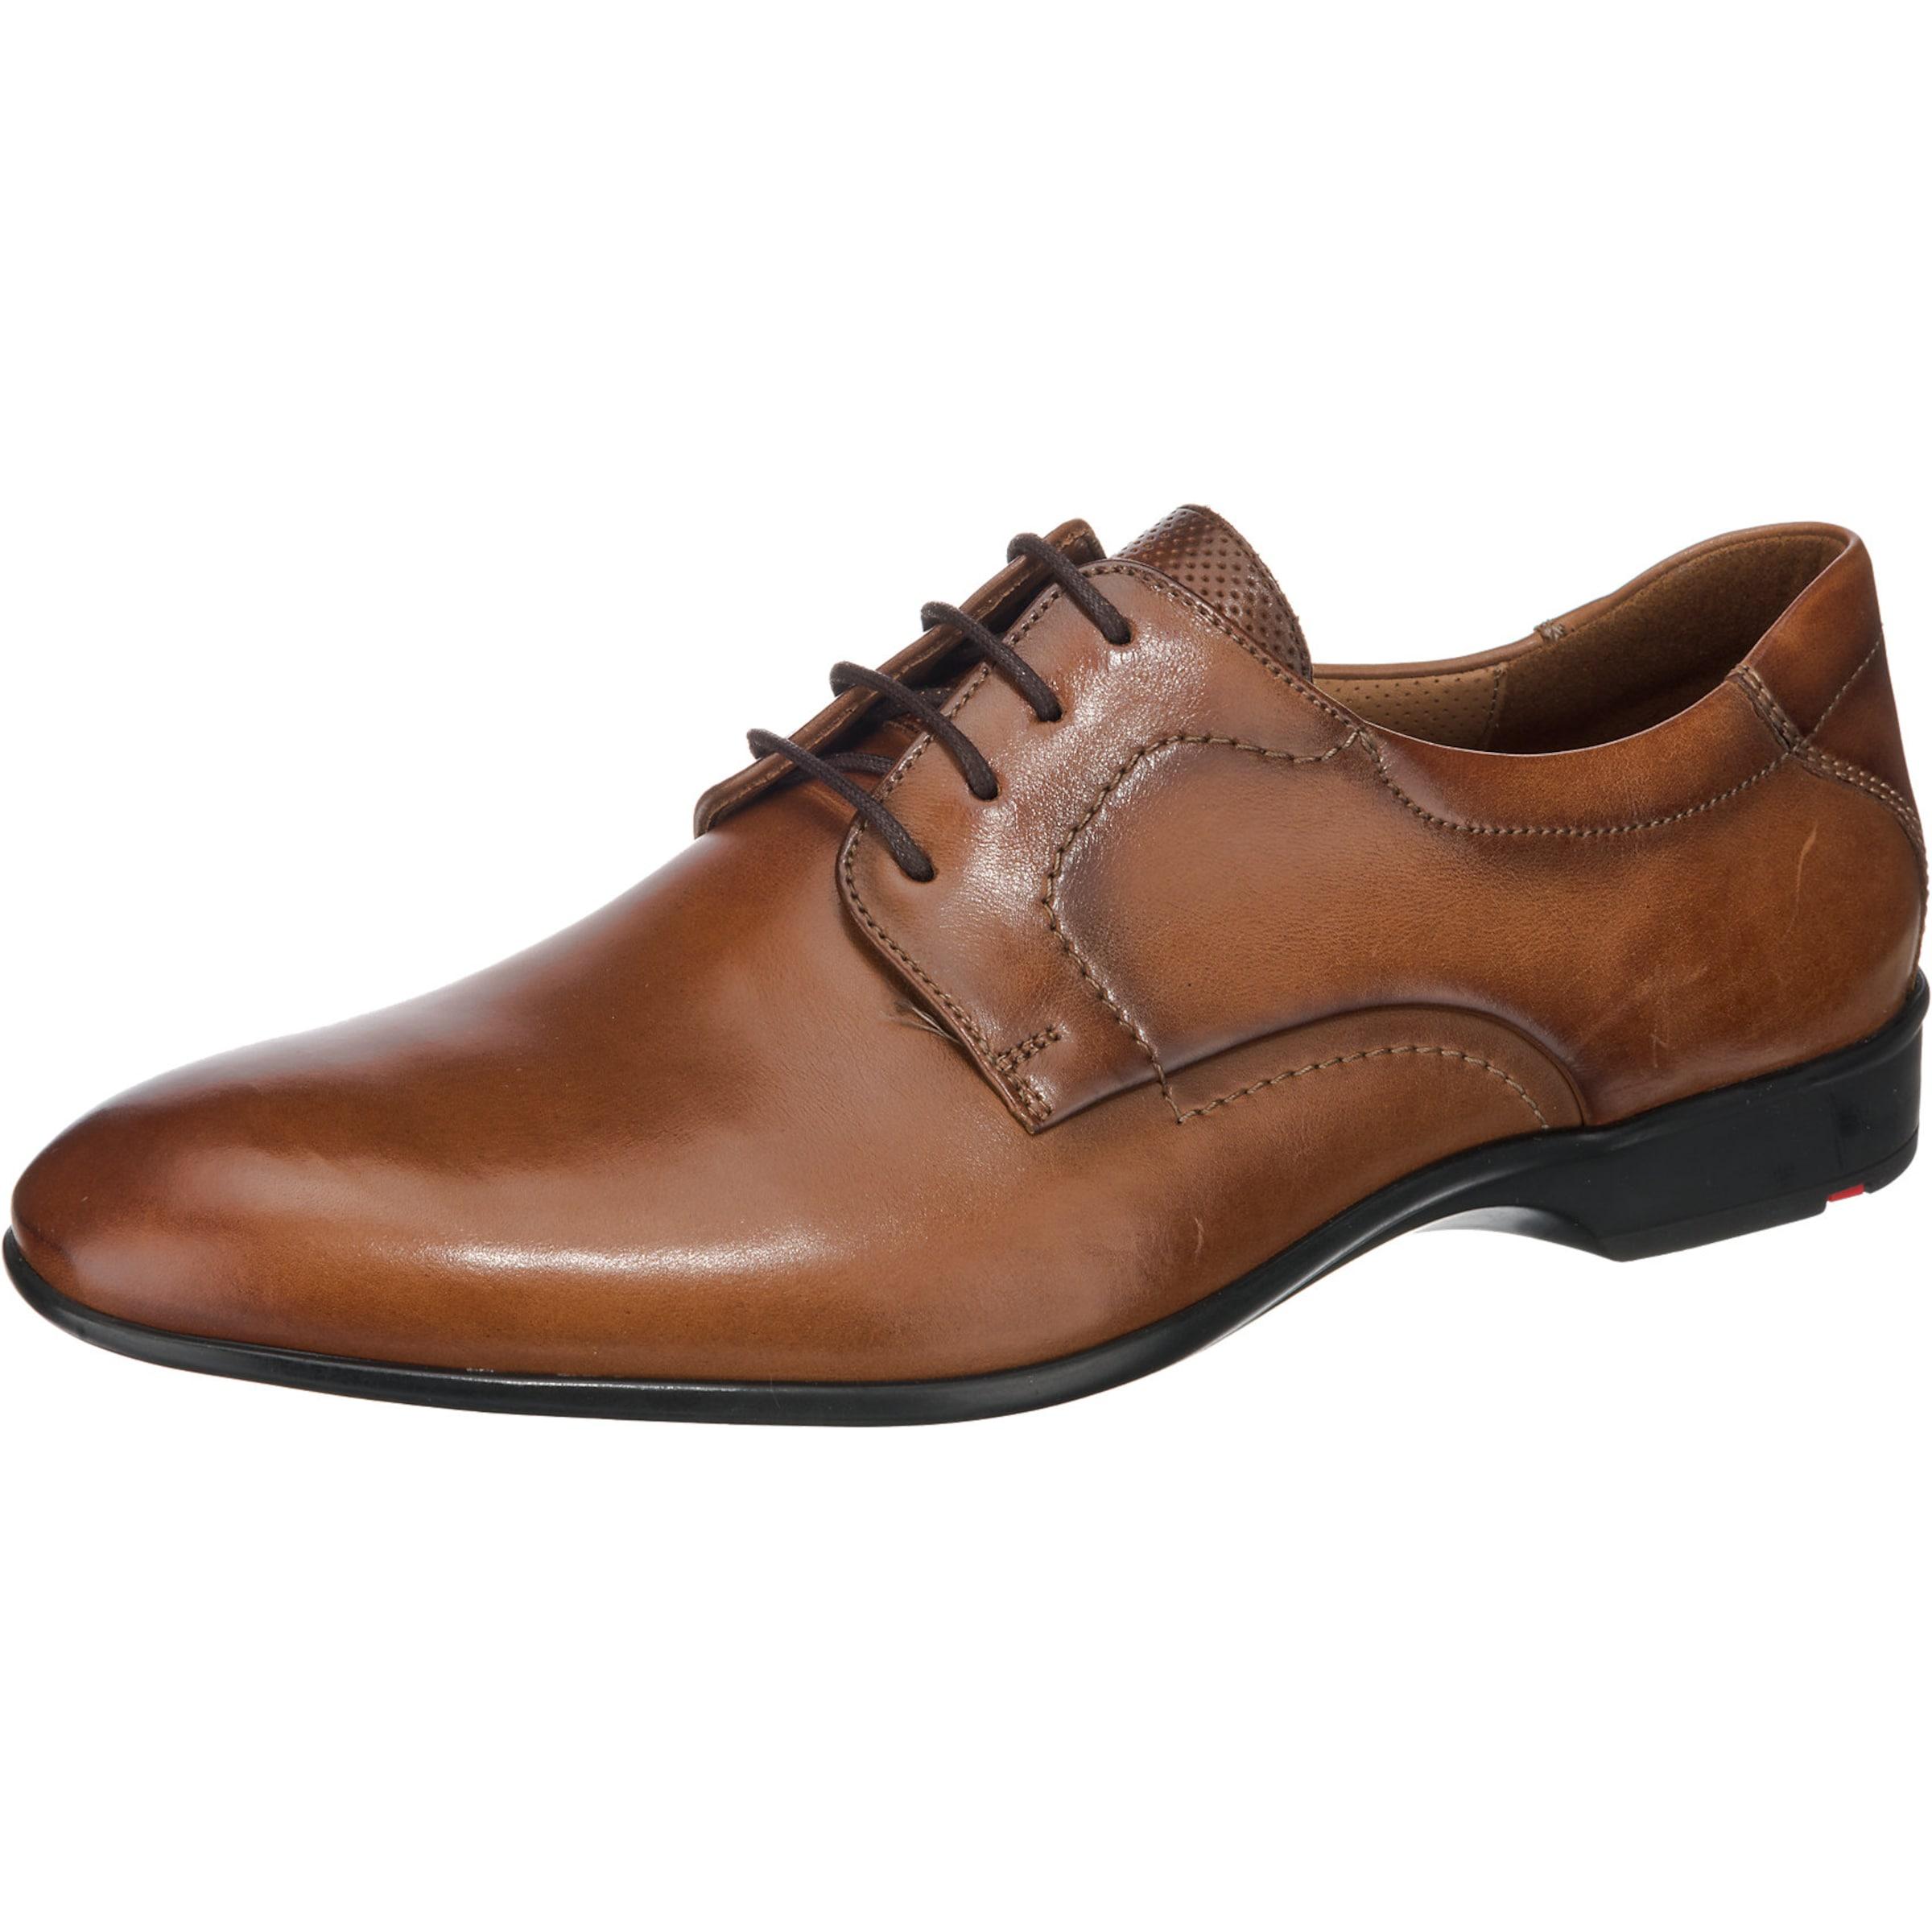 LLOYD IAN Business-Schnürschuhe Günstige und langlebige Schuhe